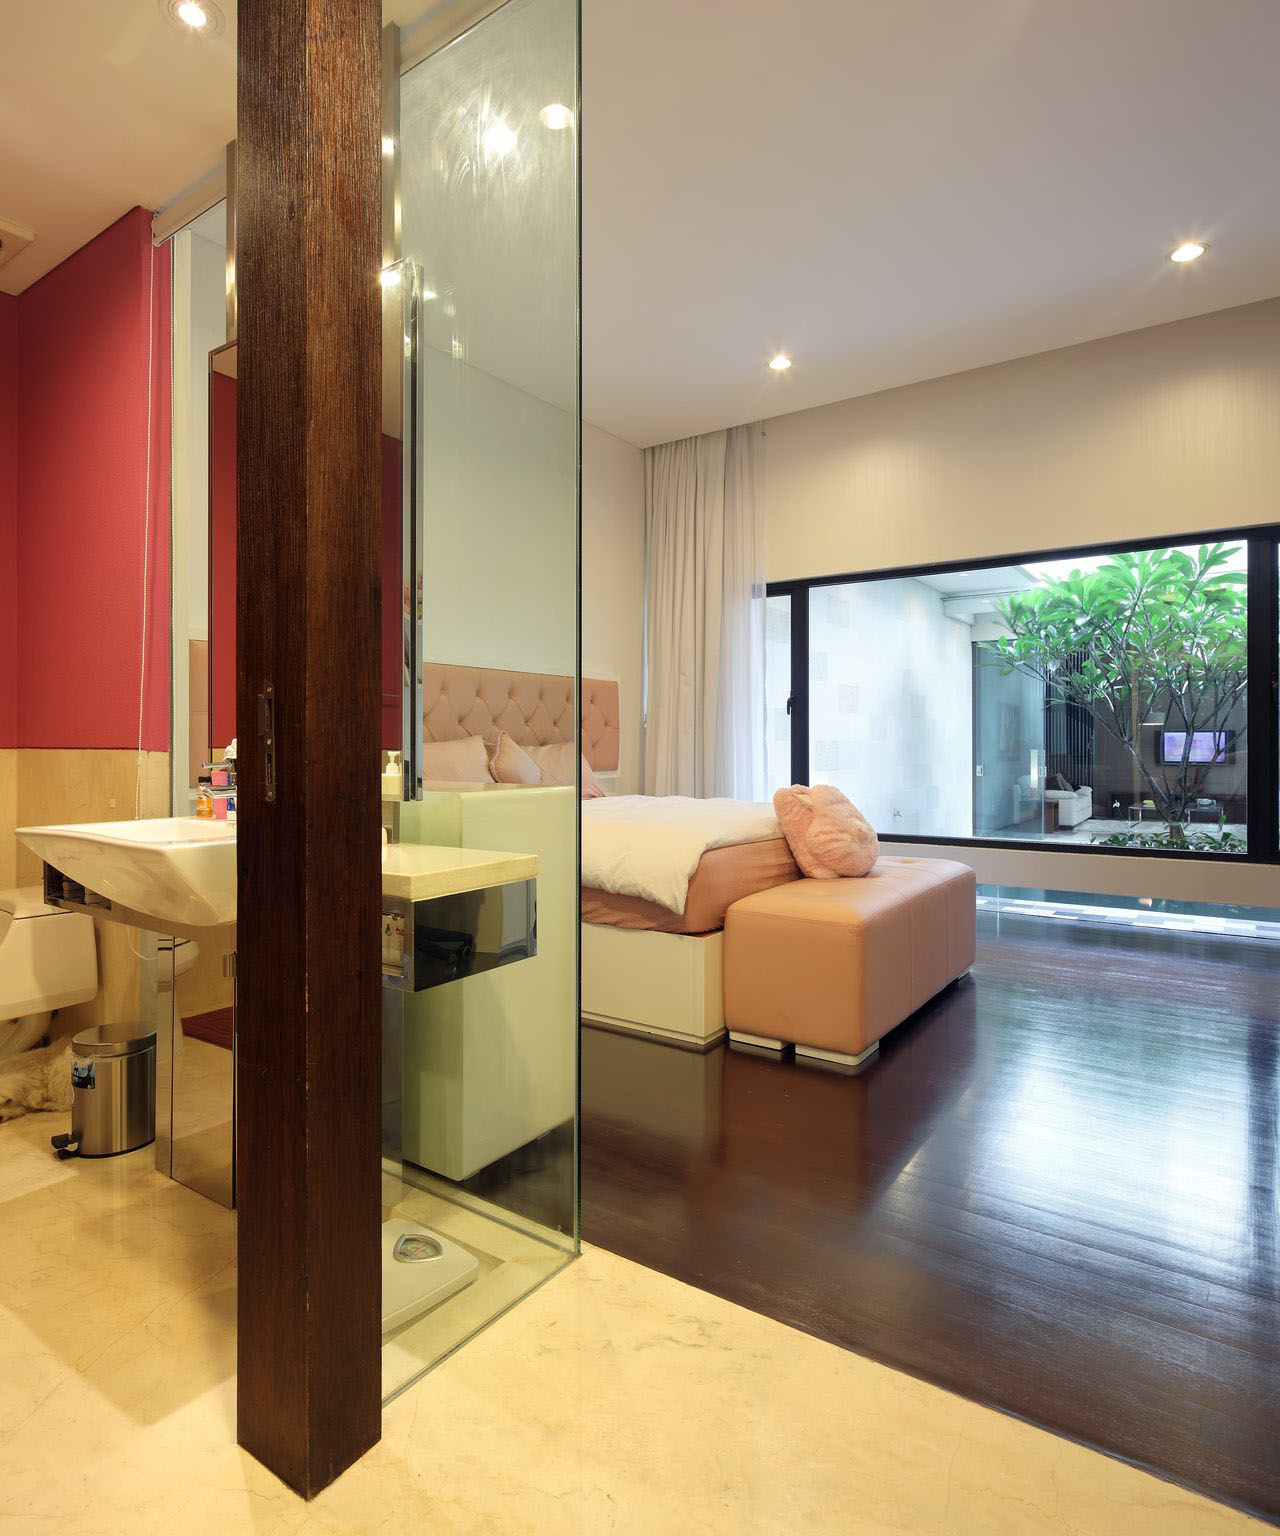 Home Interior Design Jakarta Image rbserviscom